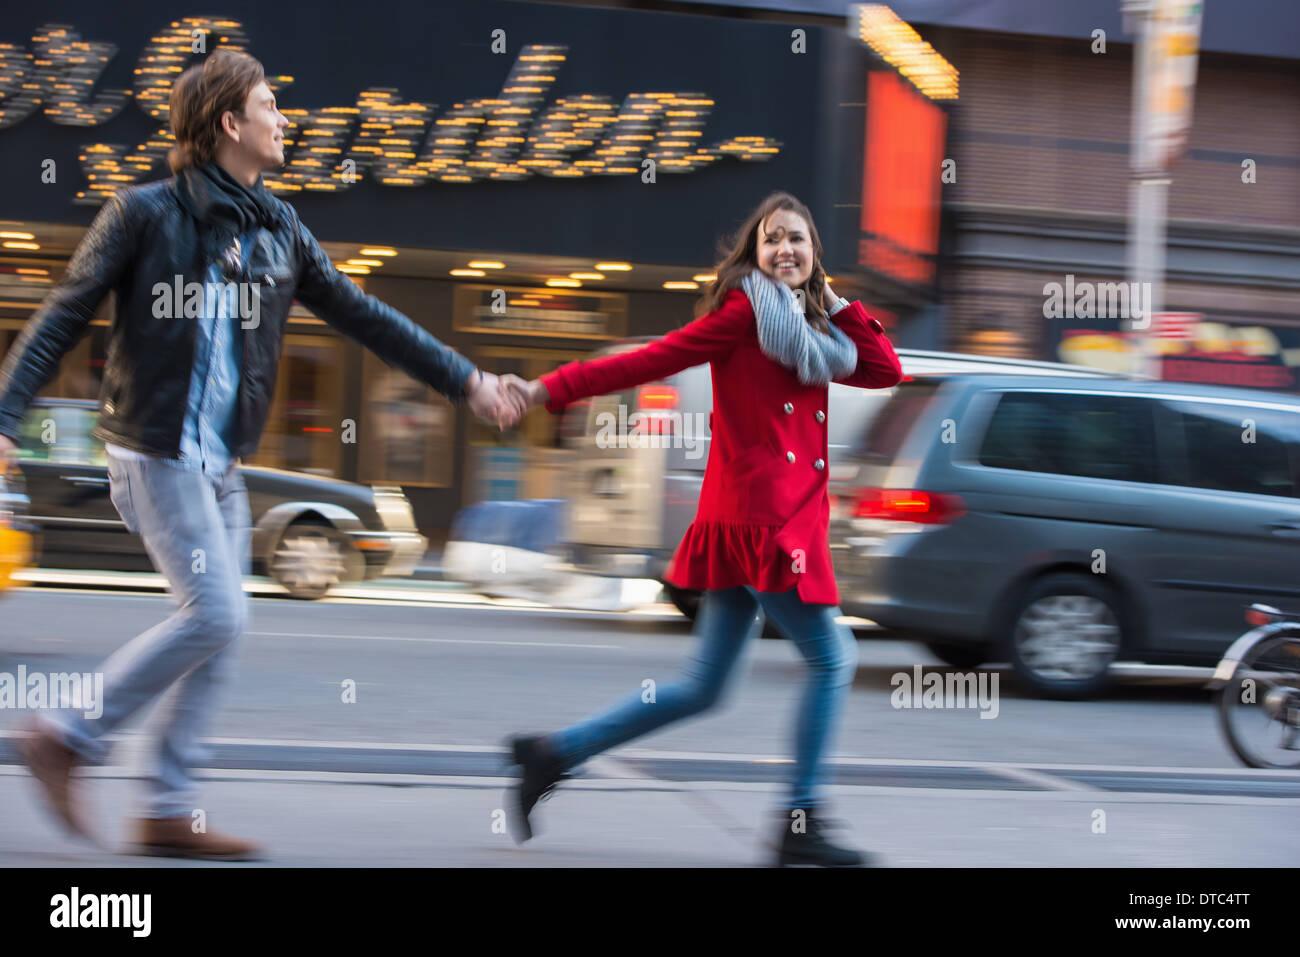 Young couple running along street, New York City, USA - Stock Image